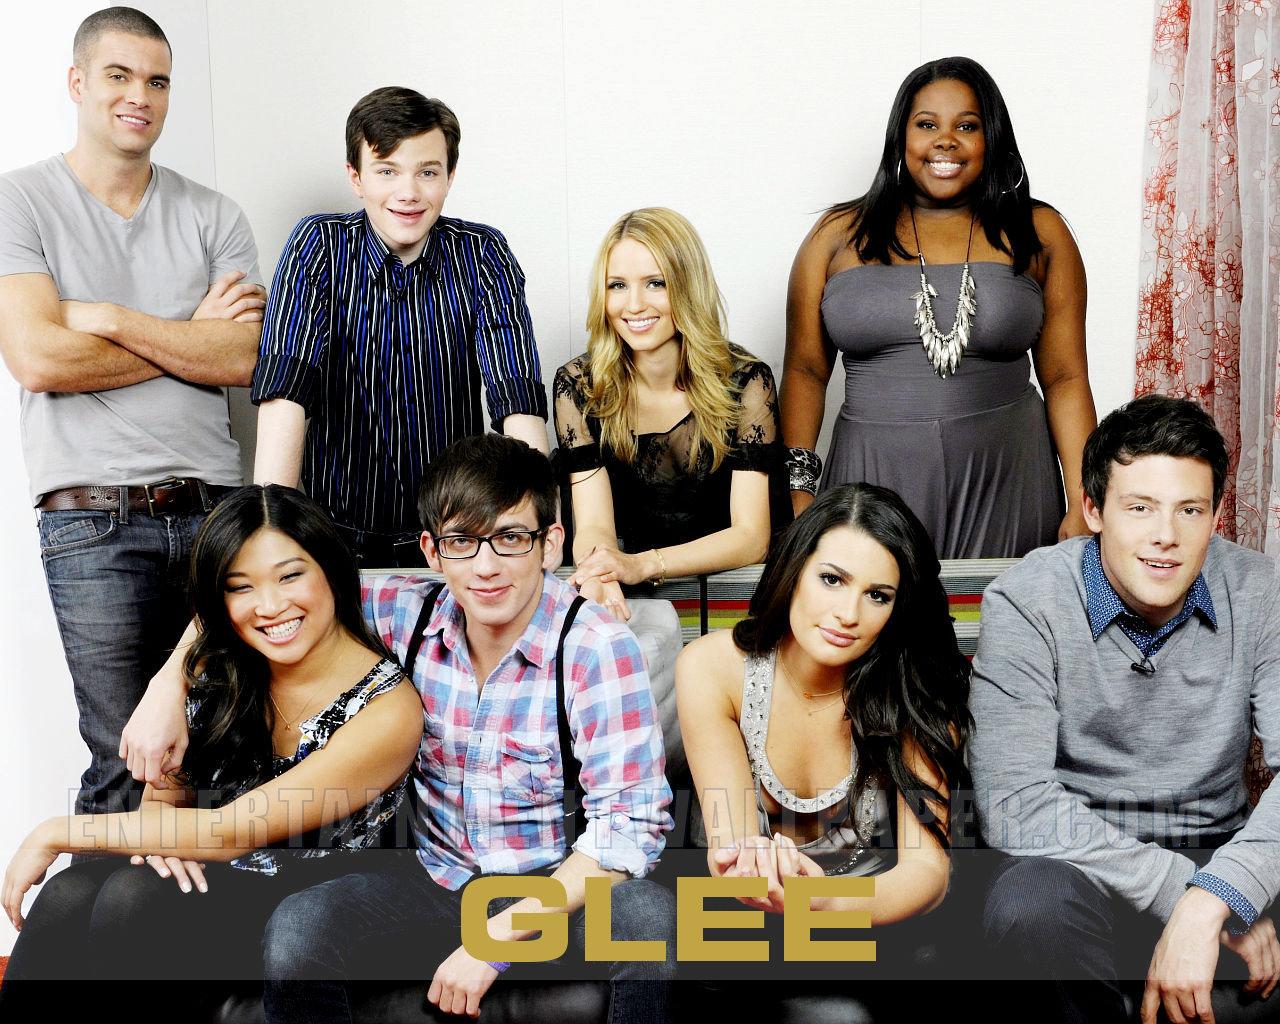 Free Download Glee Cast Wallpaper Glee Wallpaper 11658655